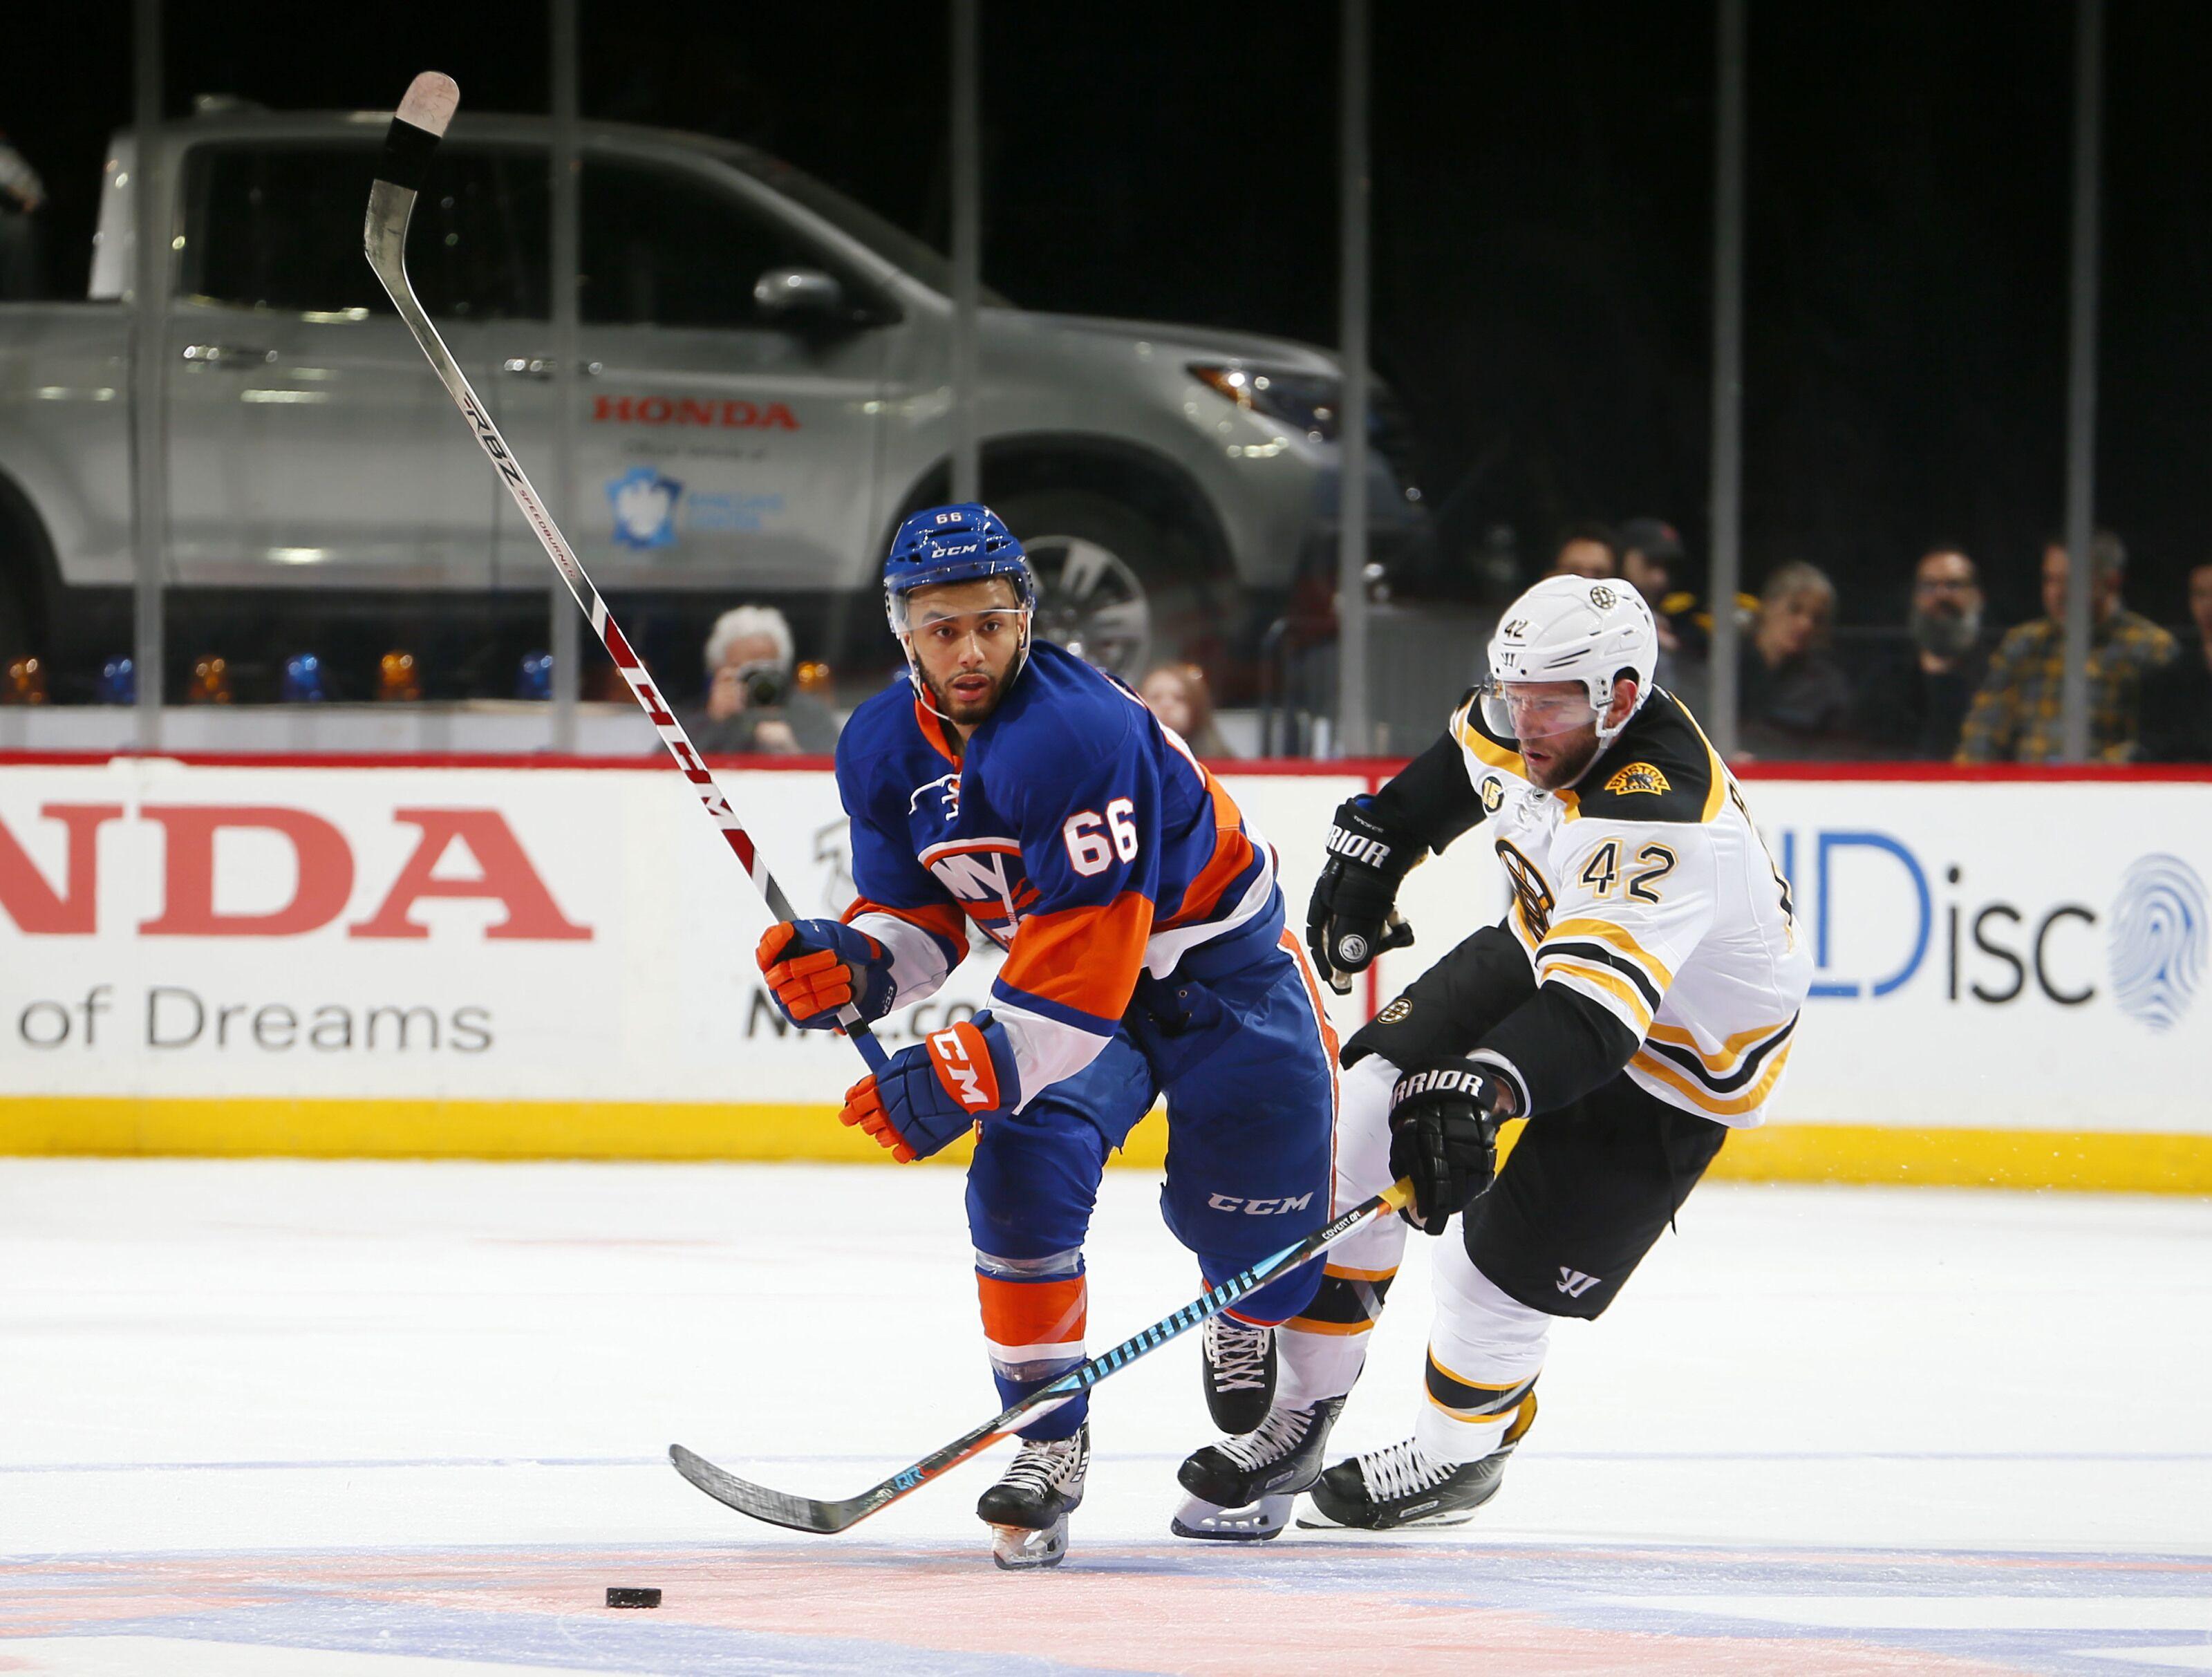 Boston Bruins: Does Joshua Ho-Sang hold any interest?